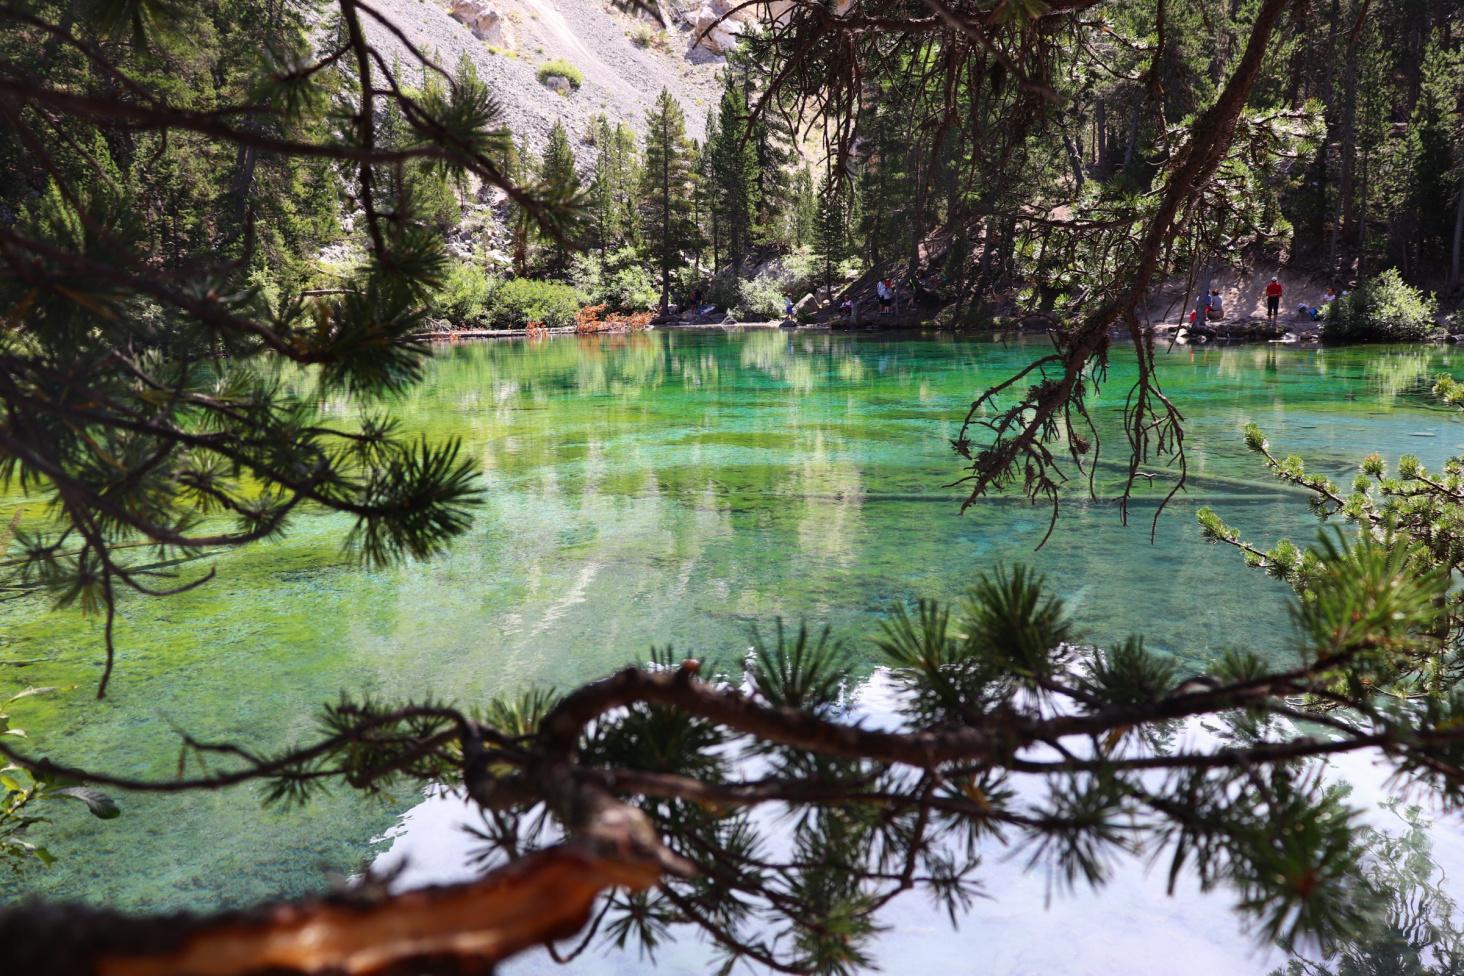 lago verde nevachè, lac vert